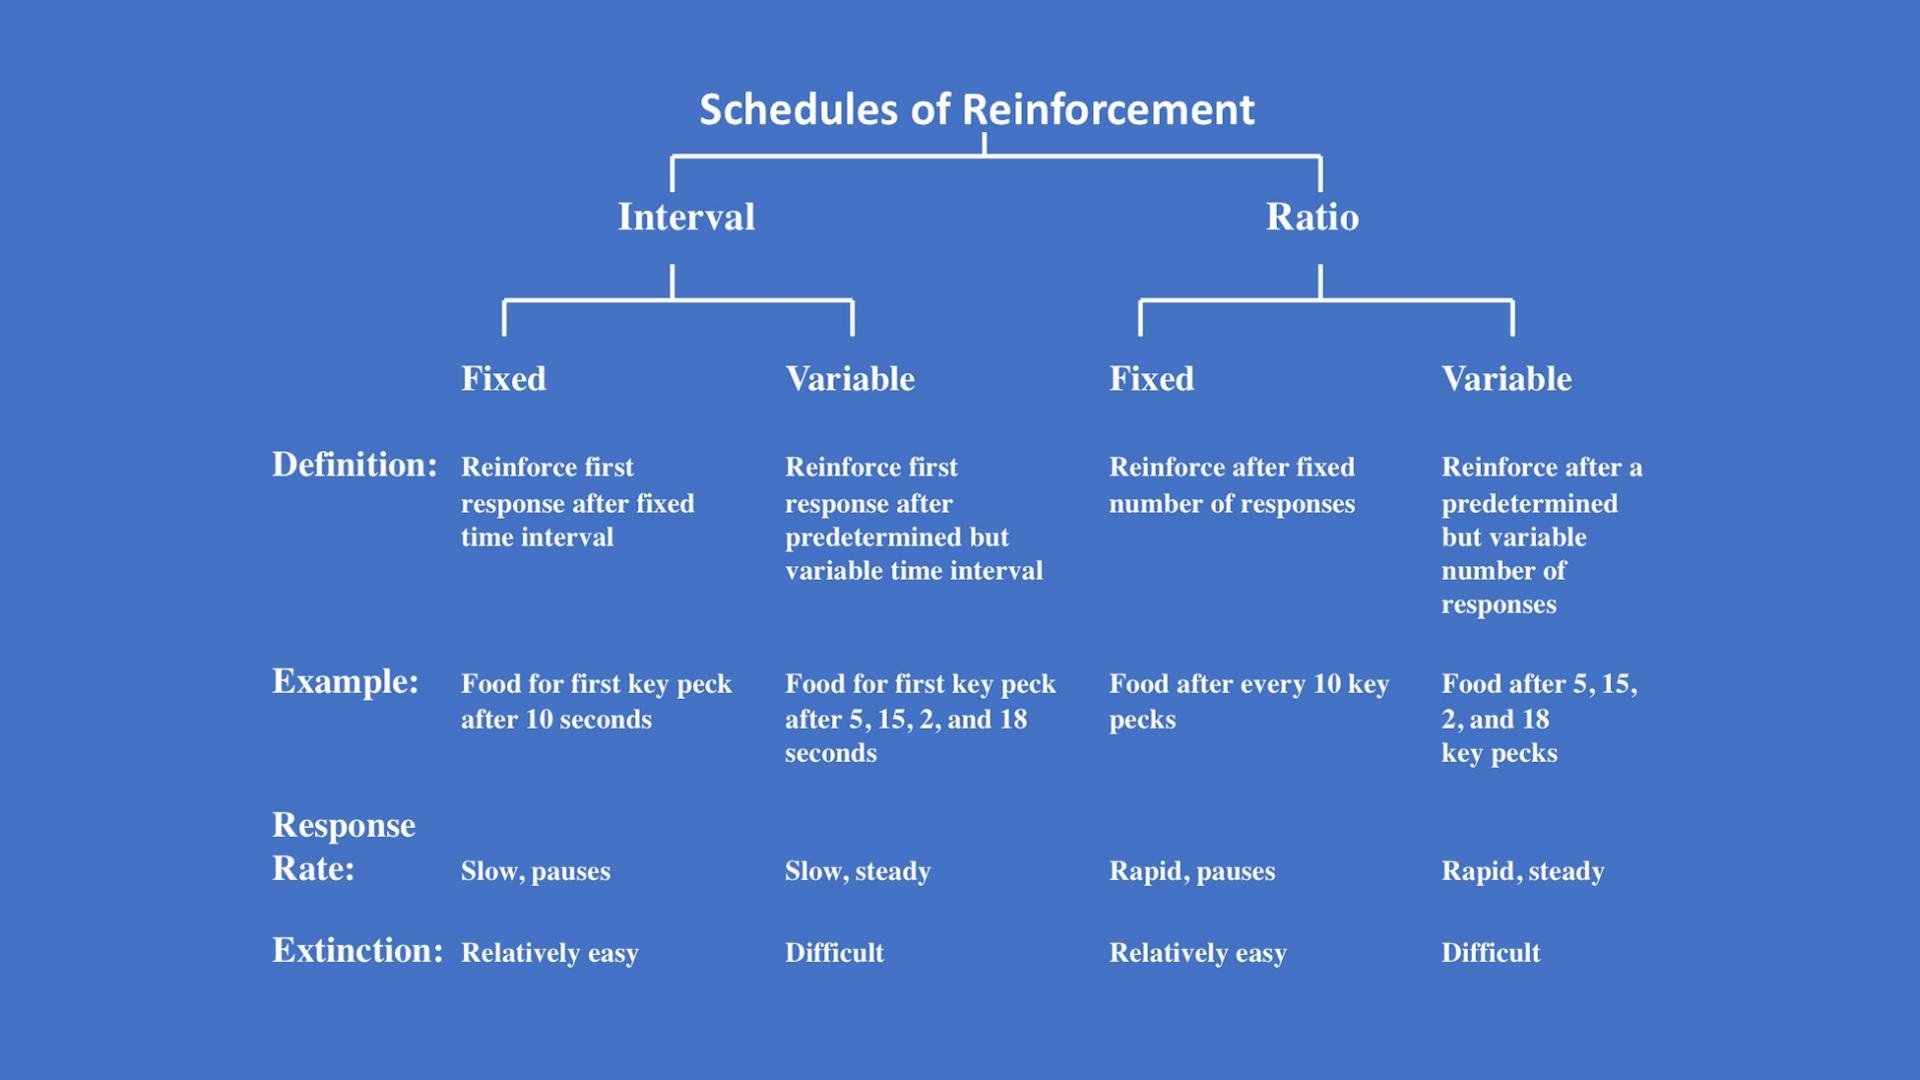 Schedules of Reinforcement Image